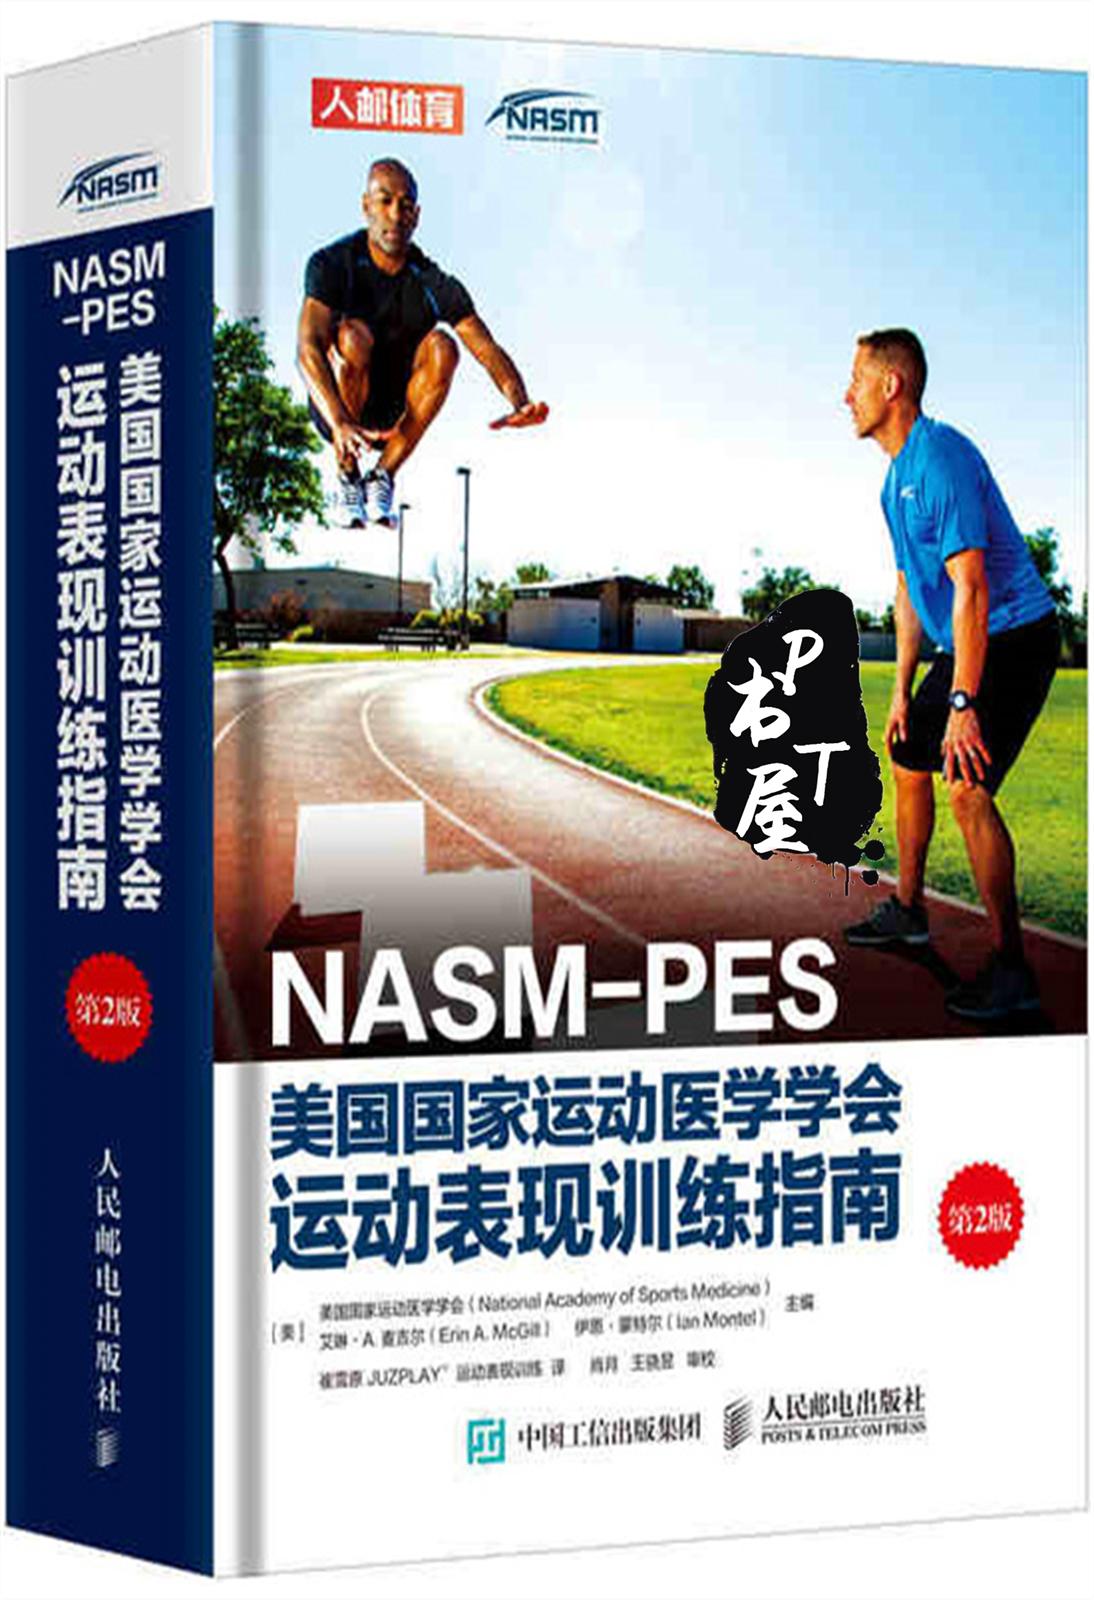 NASM-PES美国国家运动医学学会运动表现训练指南 Book Cover